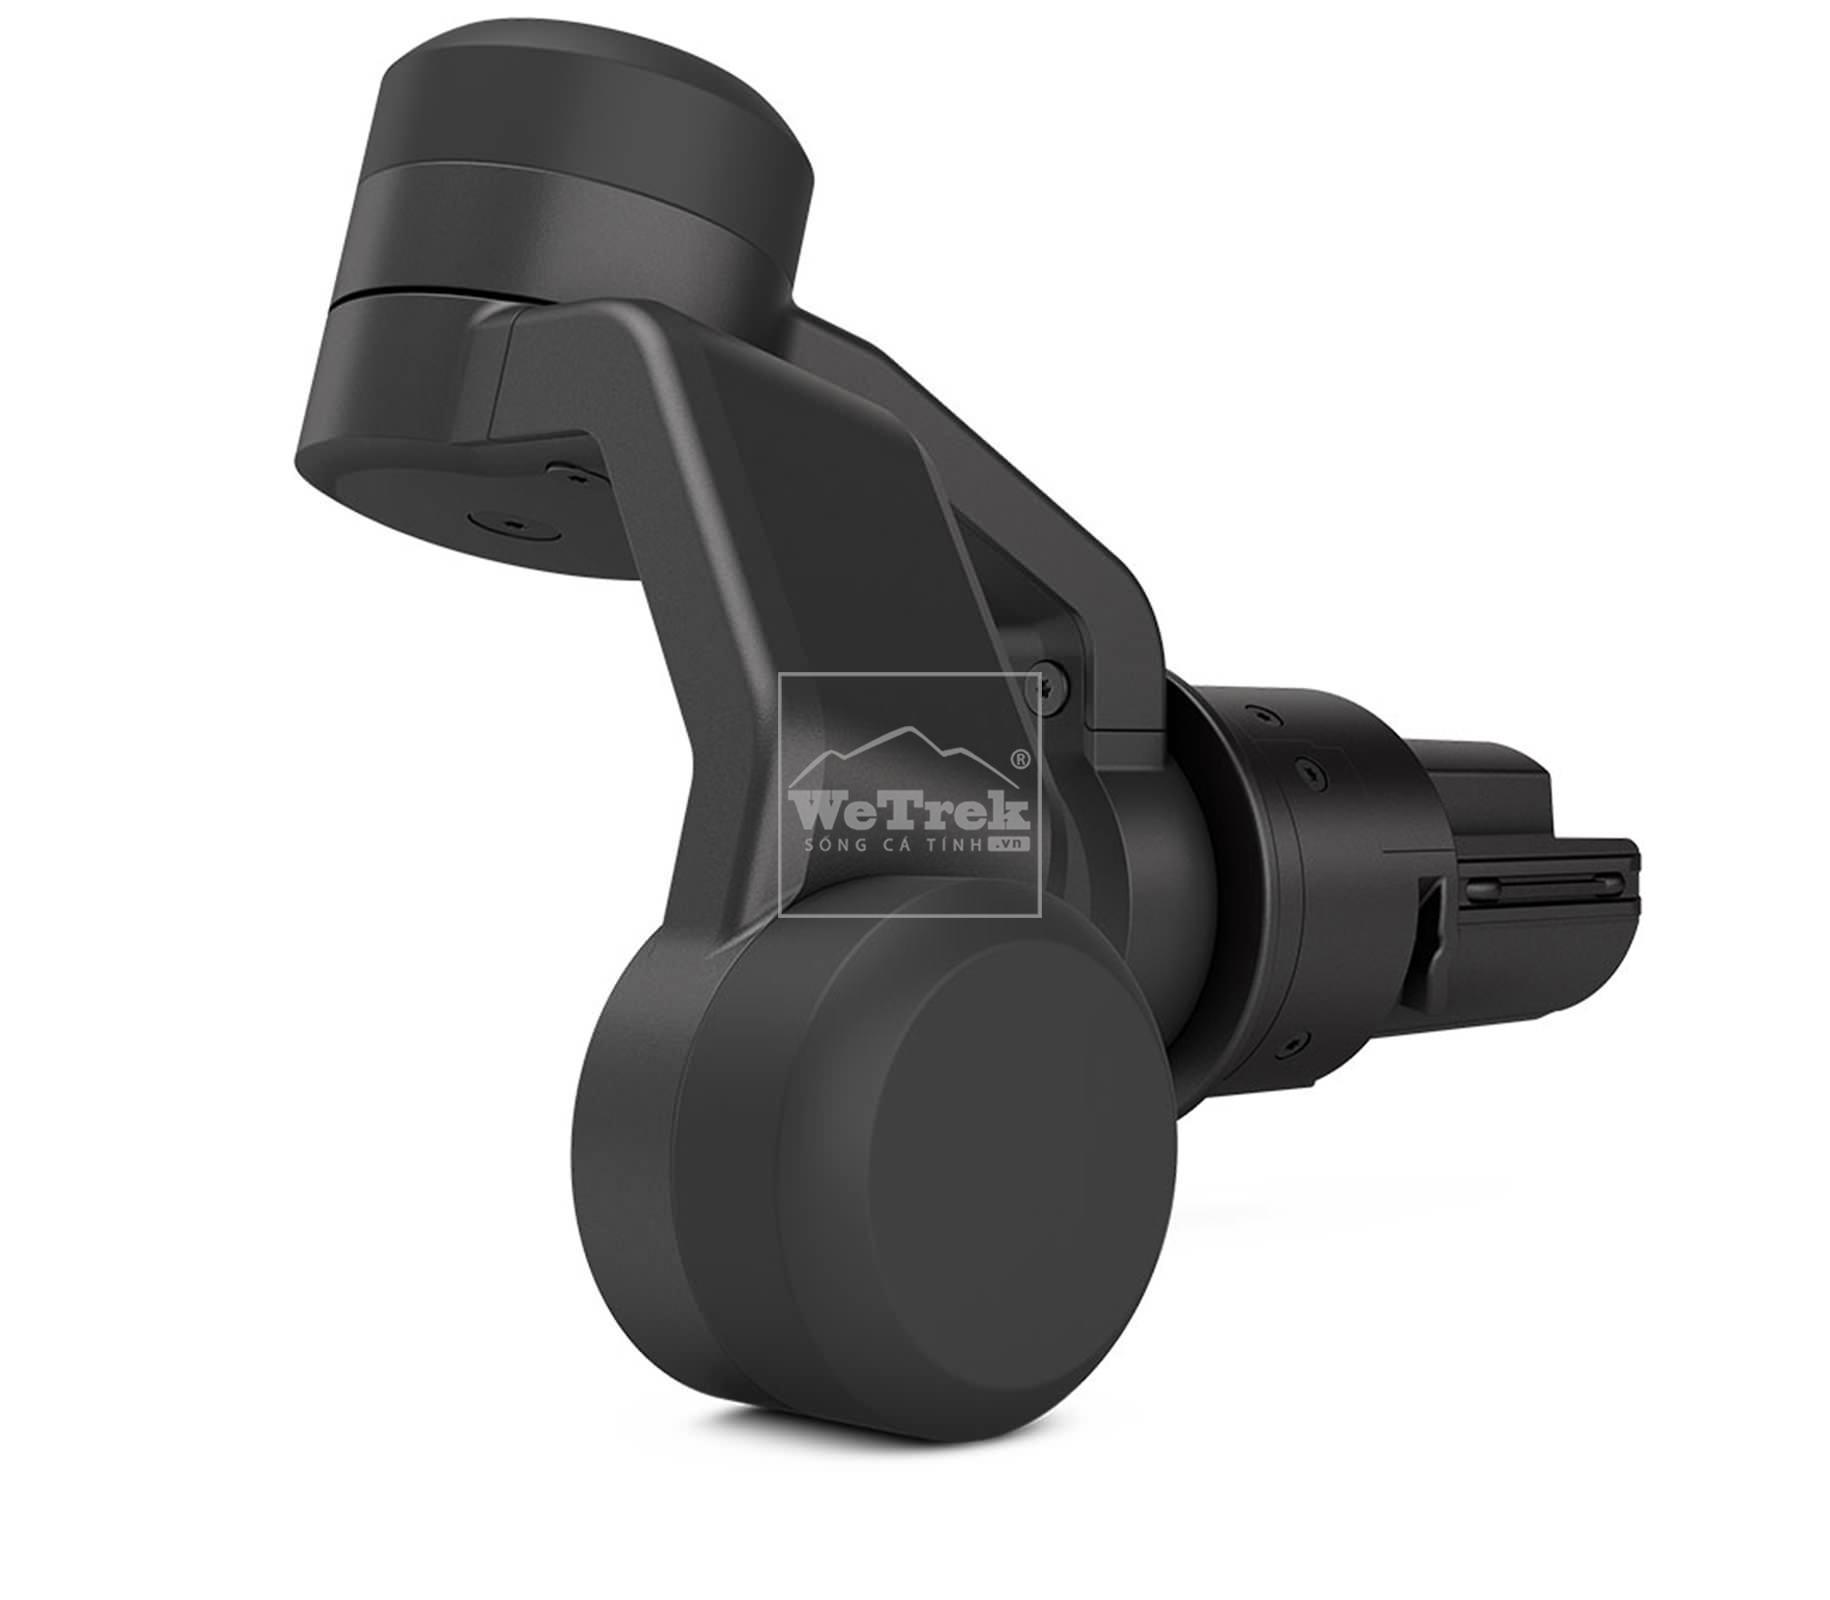 Giá chống rung gậy cầm tay GoPro Karma Stabilizer - 7583